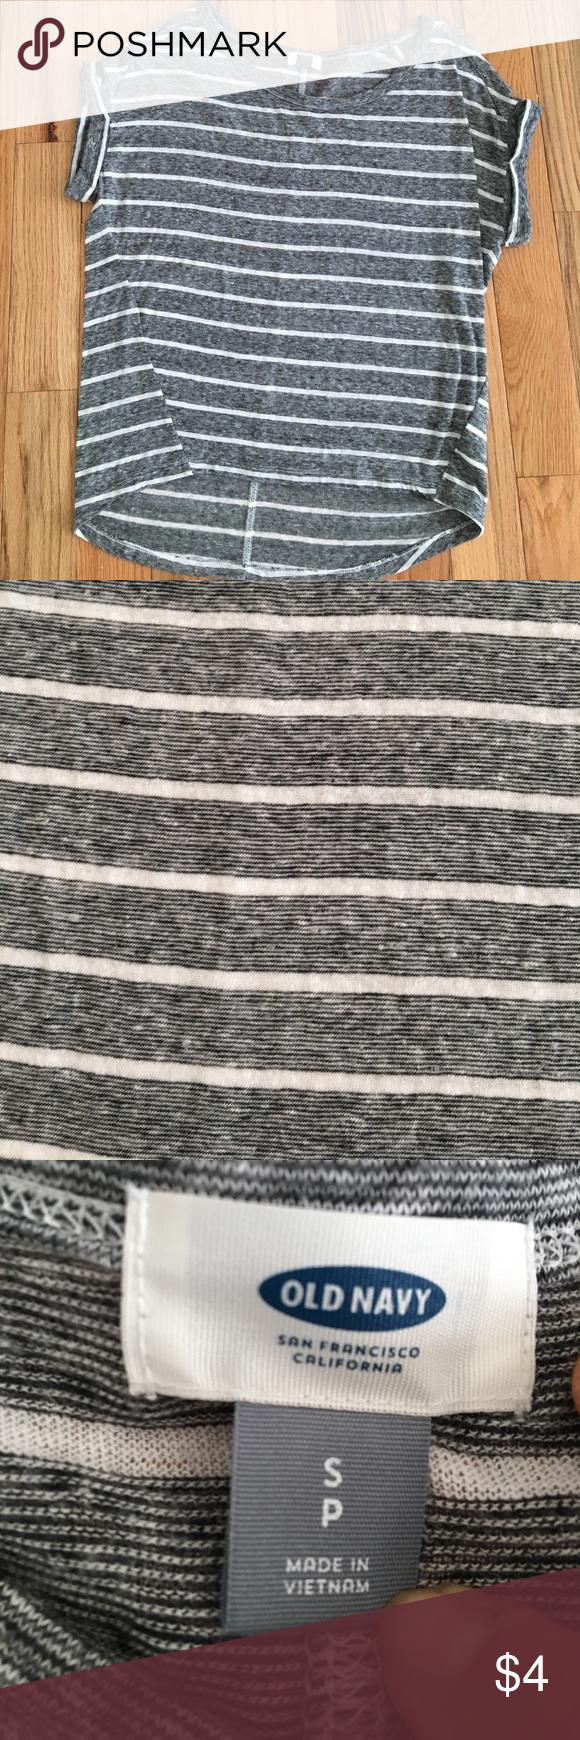 Black t shirt old navy - Old Navy Striped T Shirt